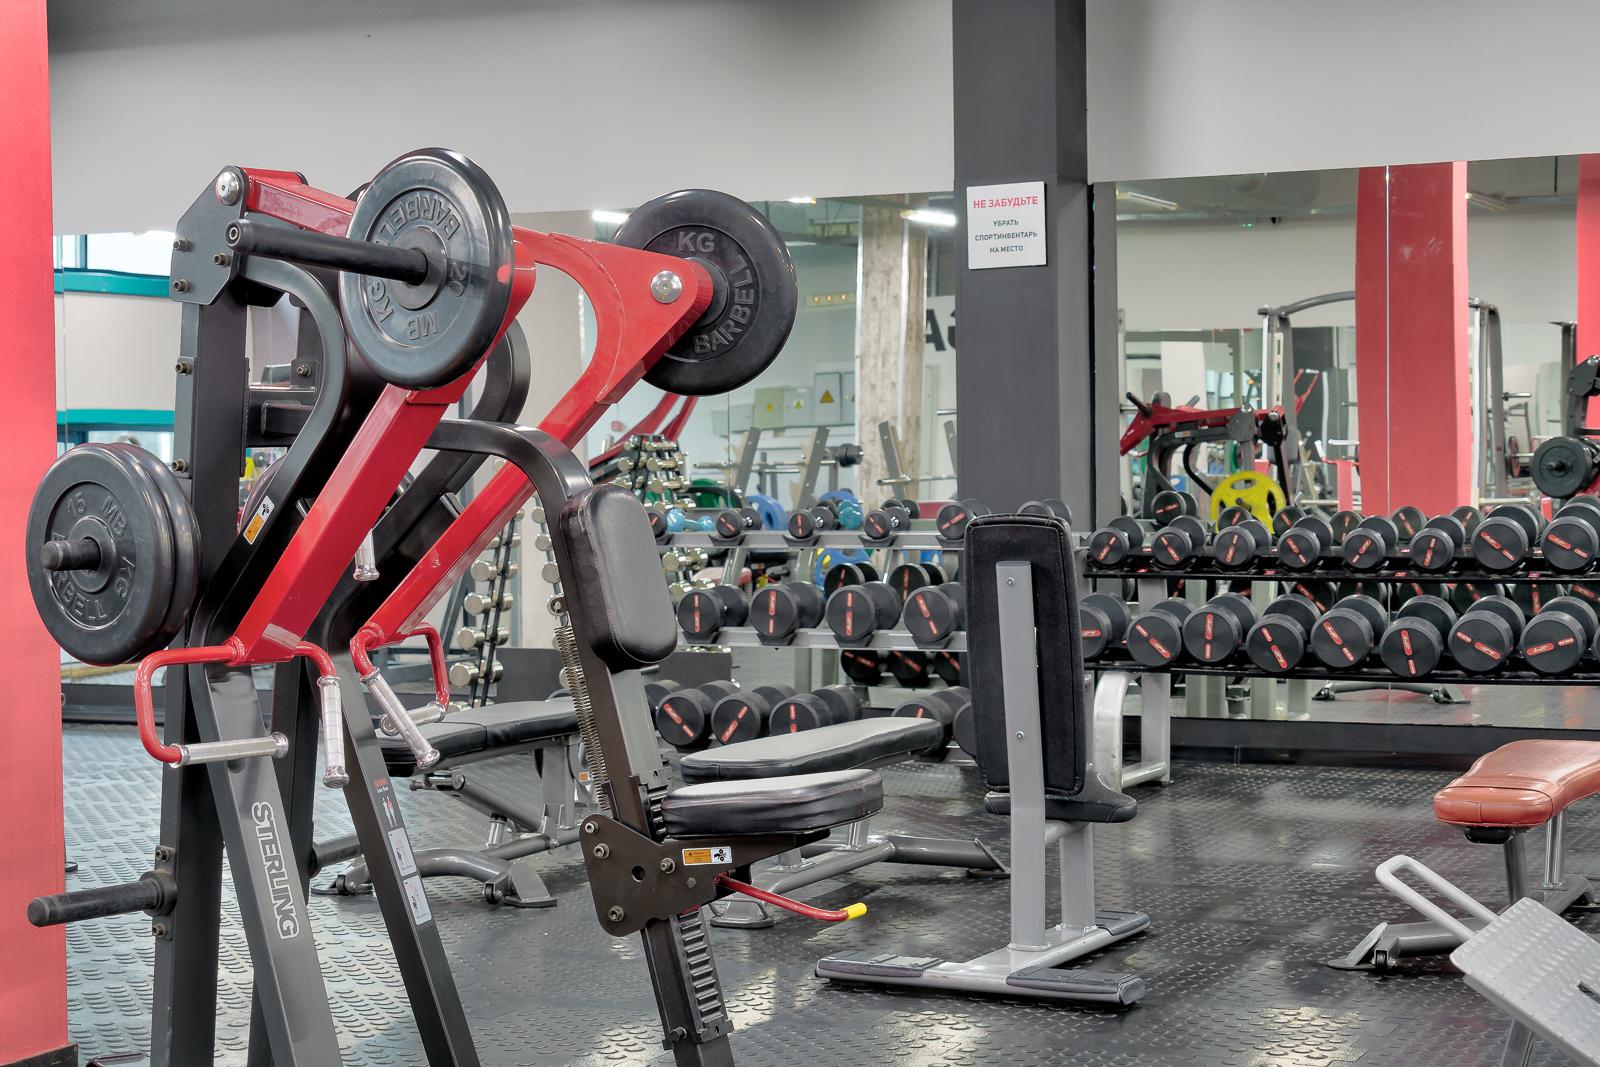 интерьерная съёмка фитнес клуба